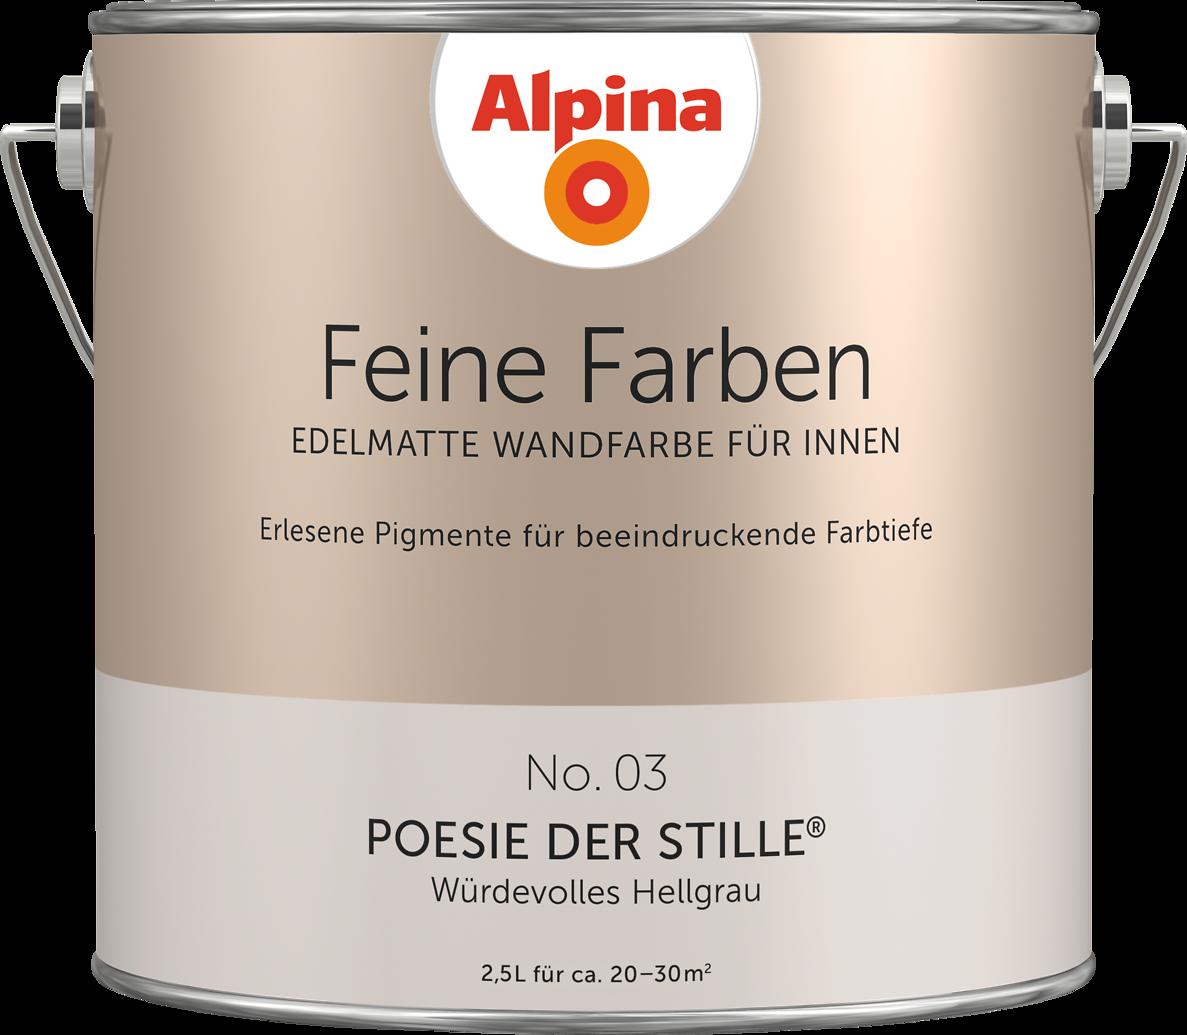 premium wandfarbe grau hellgrau alpina feine farben. Black Bedroom Furniture Sets. Home Design Ideas